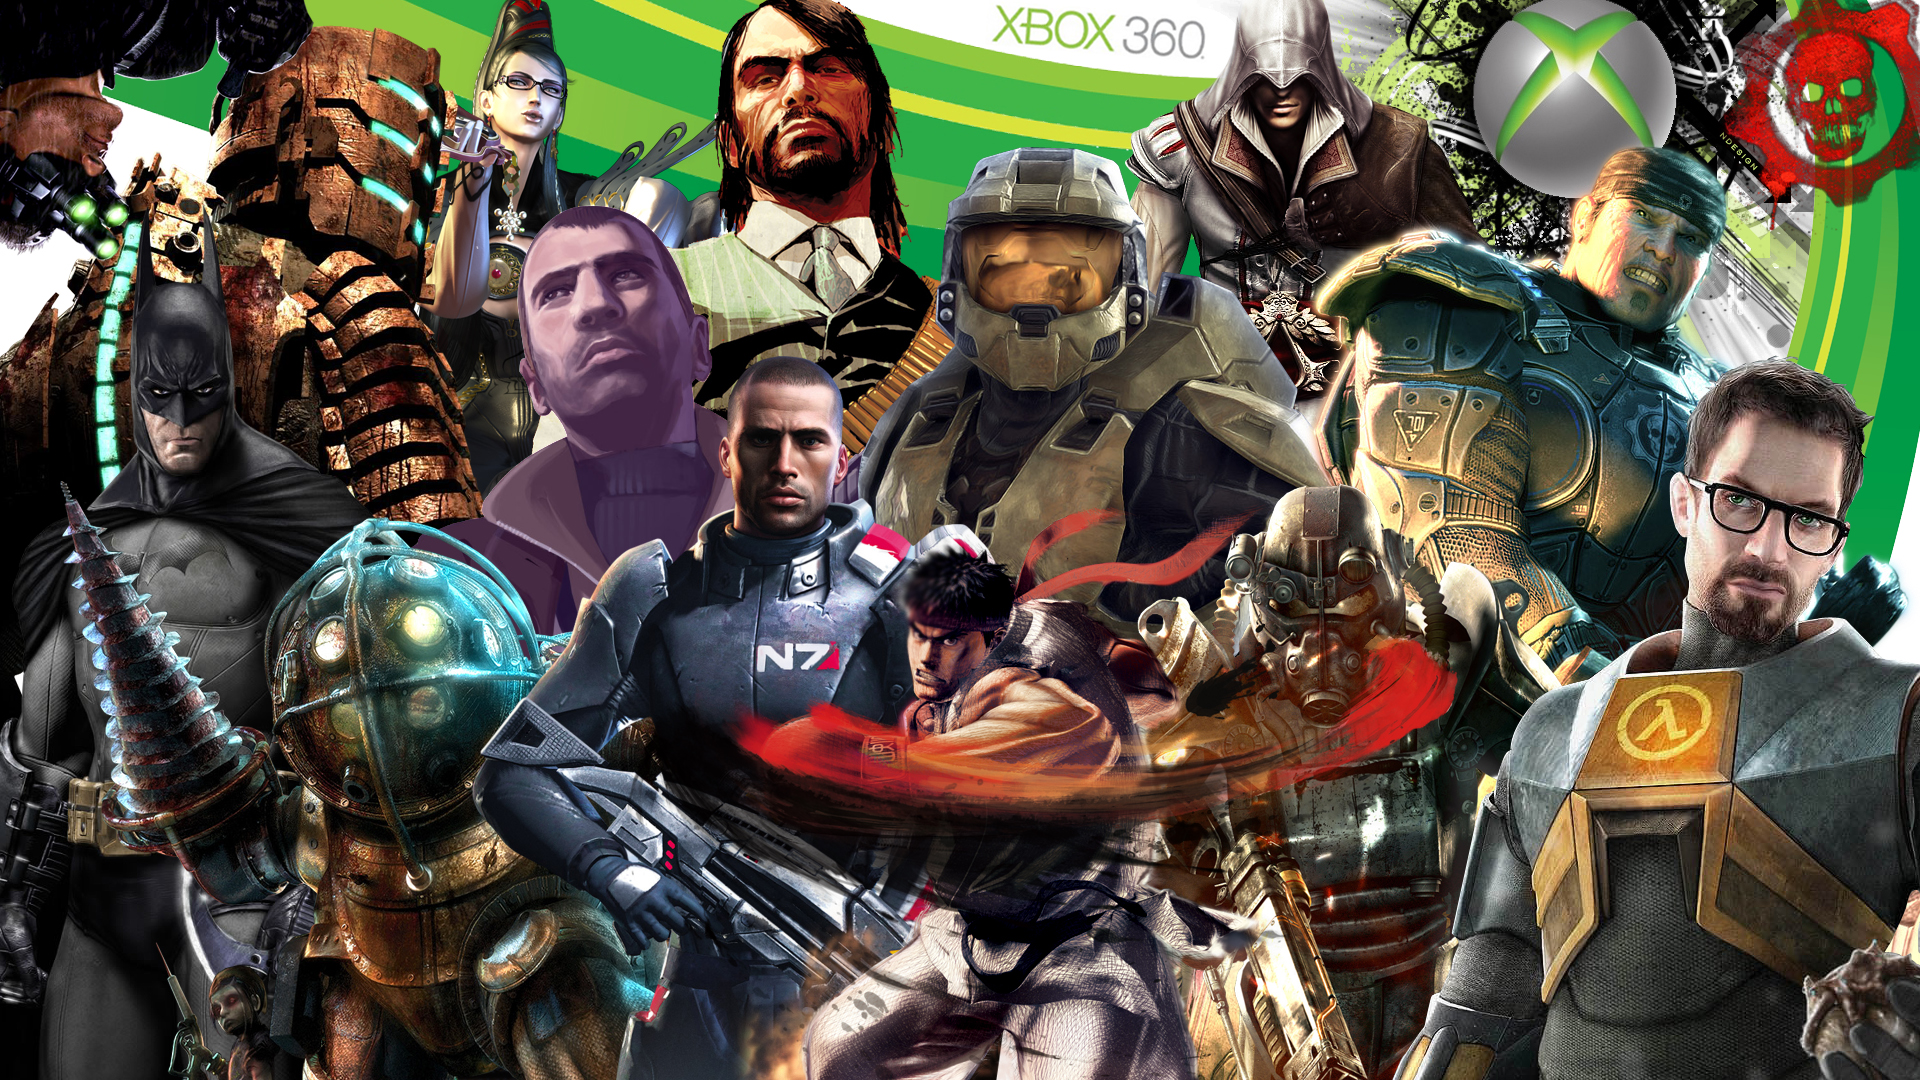 Xbox Games wallpaper - 180776 Xbox Games Wallpaper